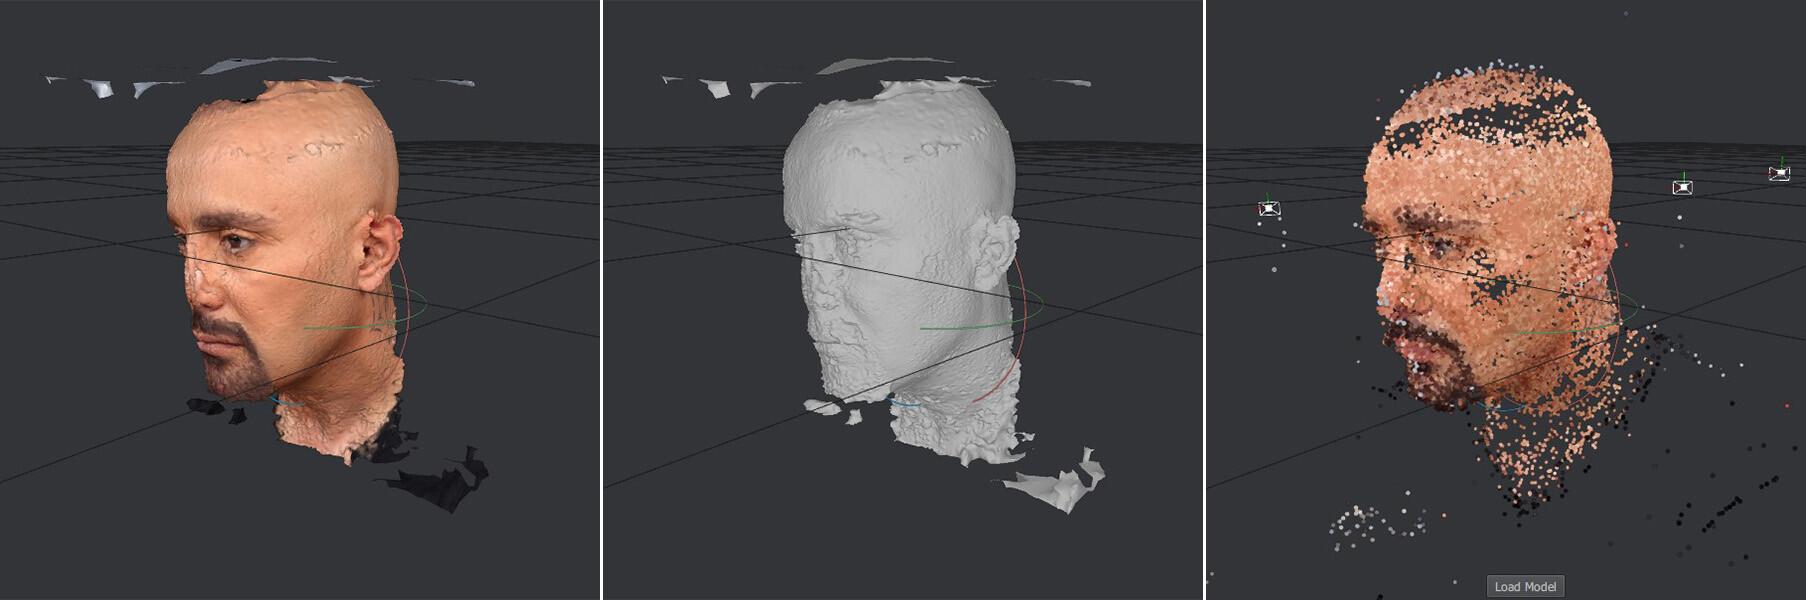 Photogrammetry result